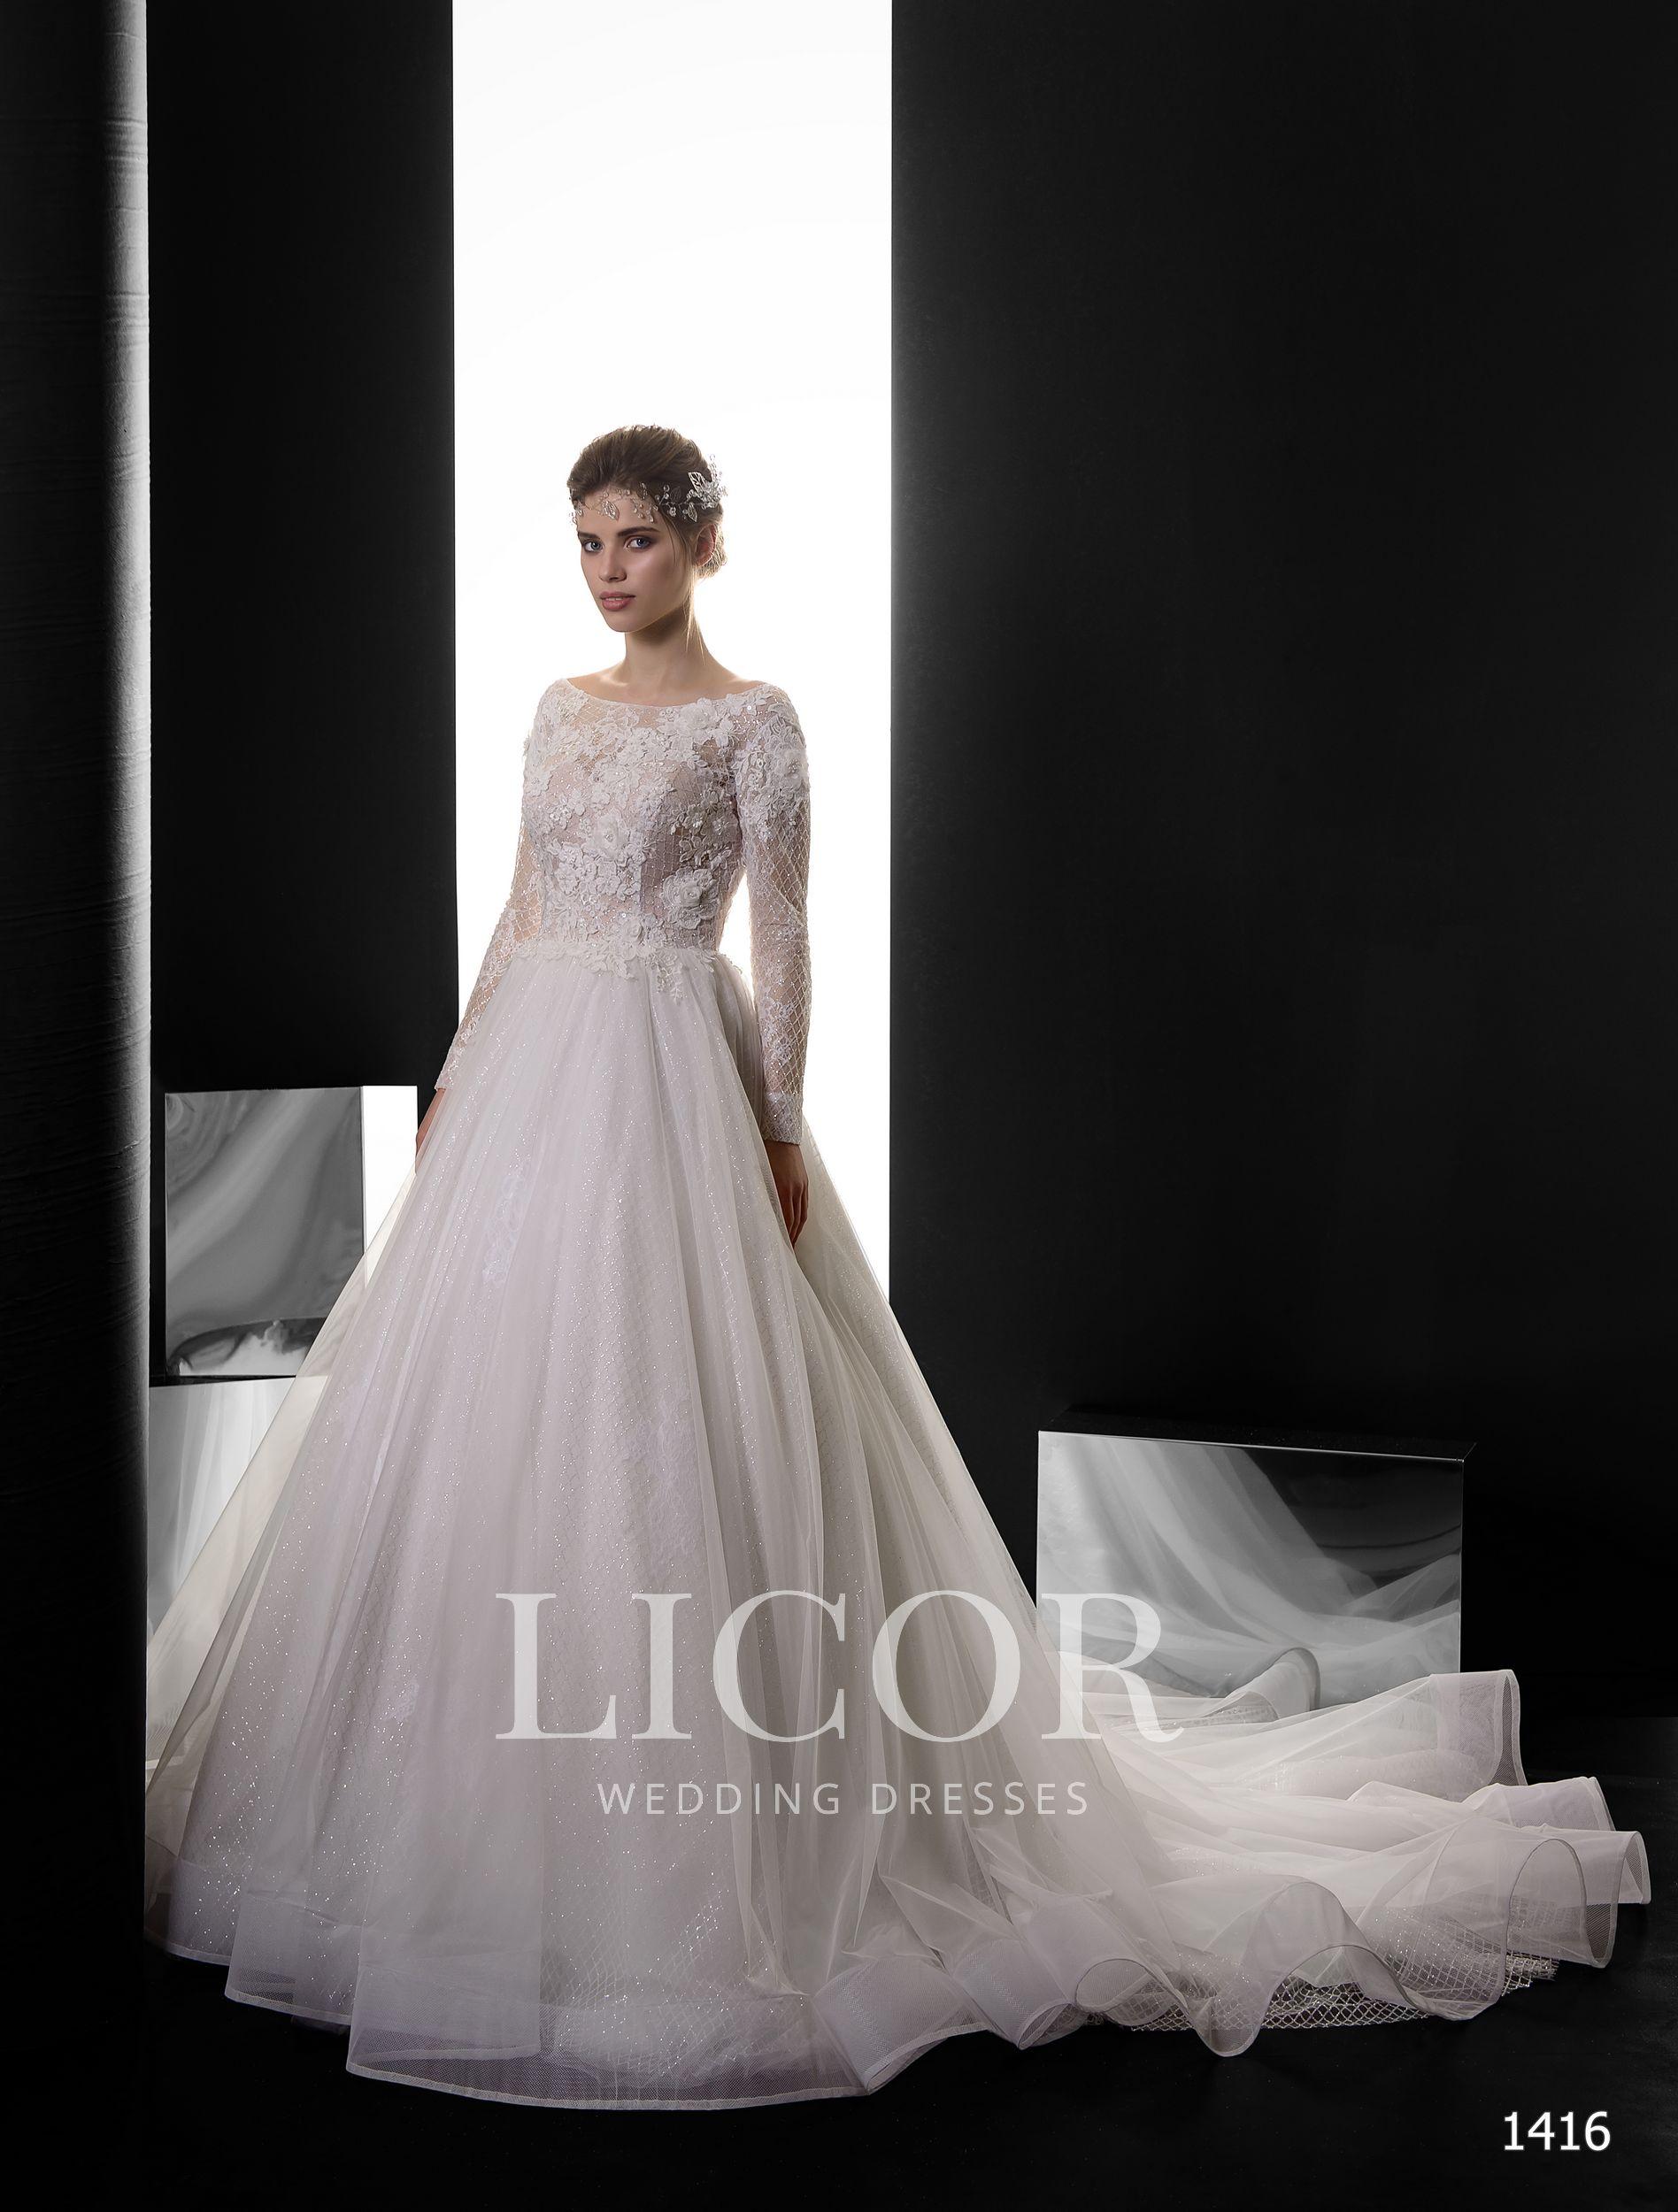 https://licor.com.ua/images/stories/virtuemart/product/1416(1).jpg